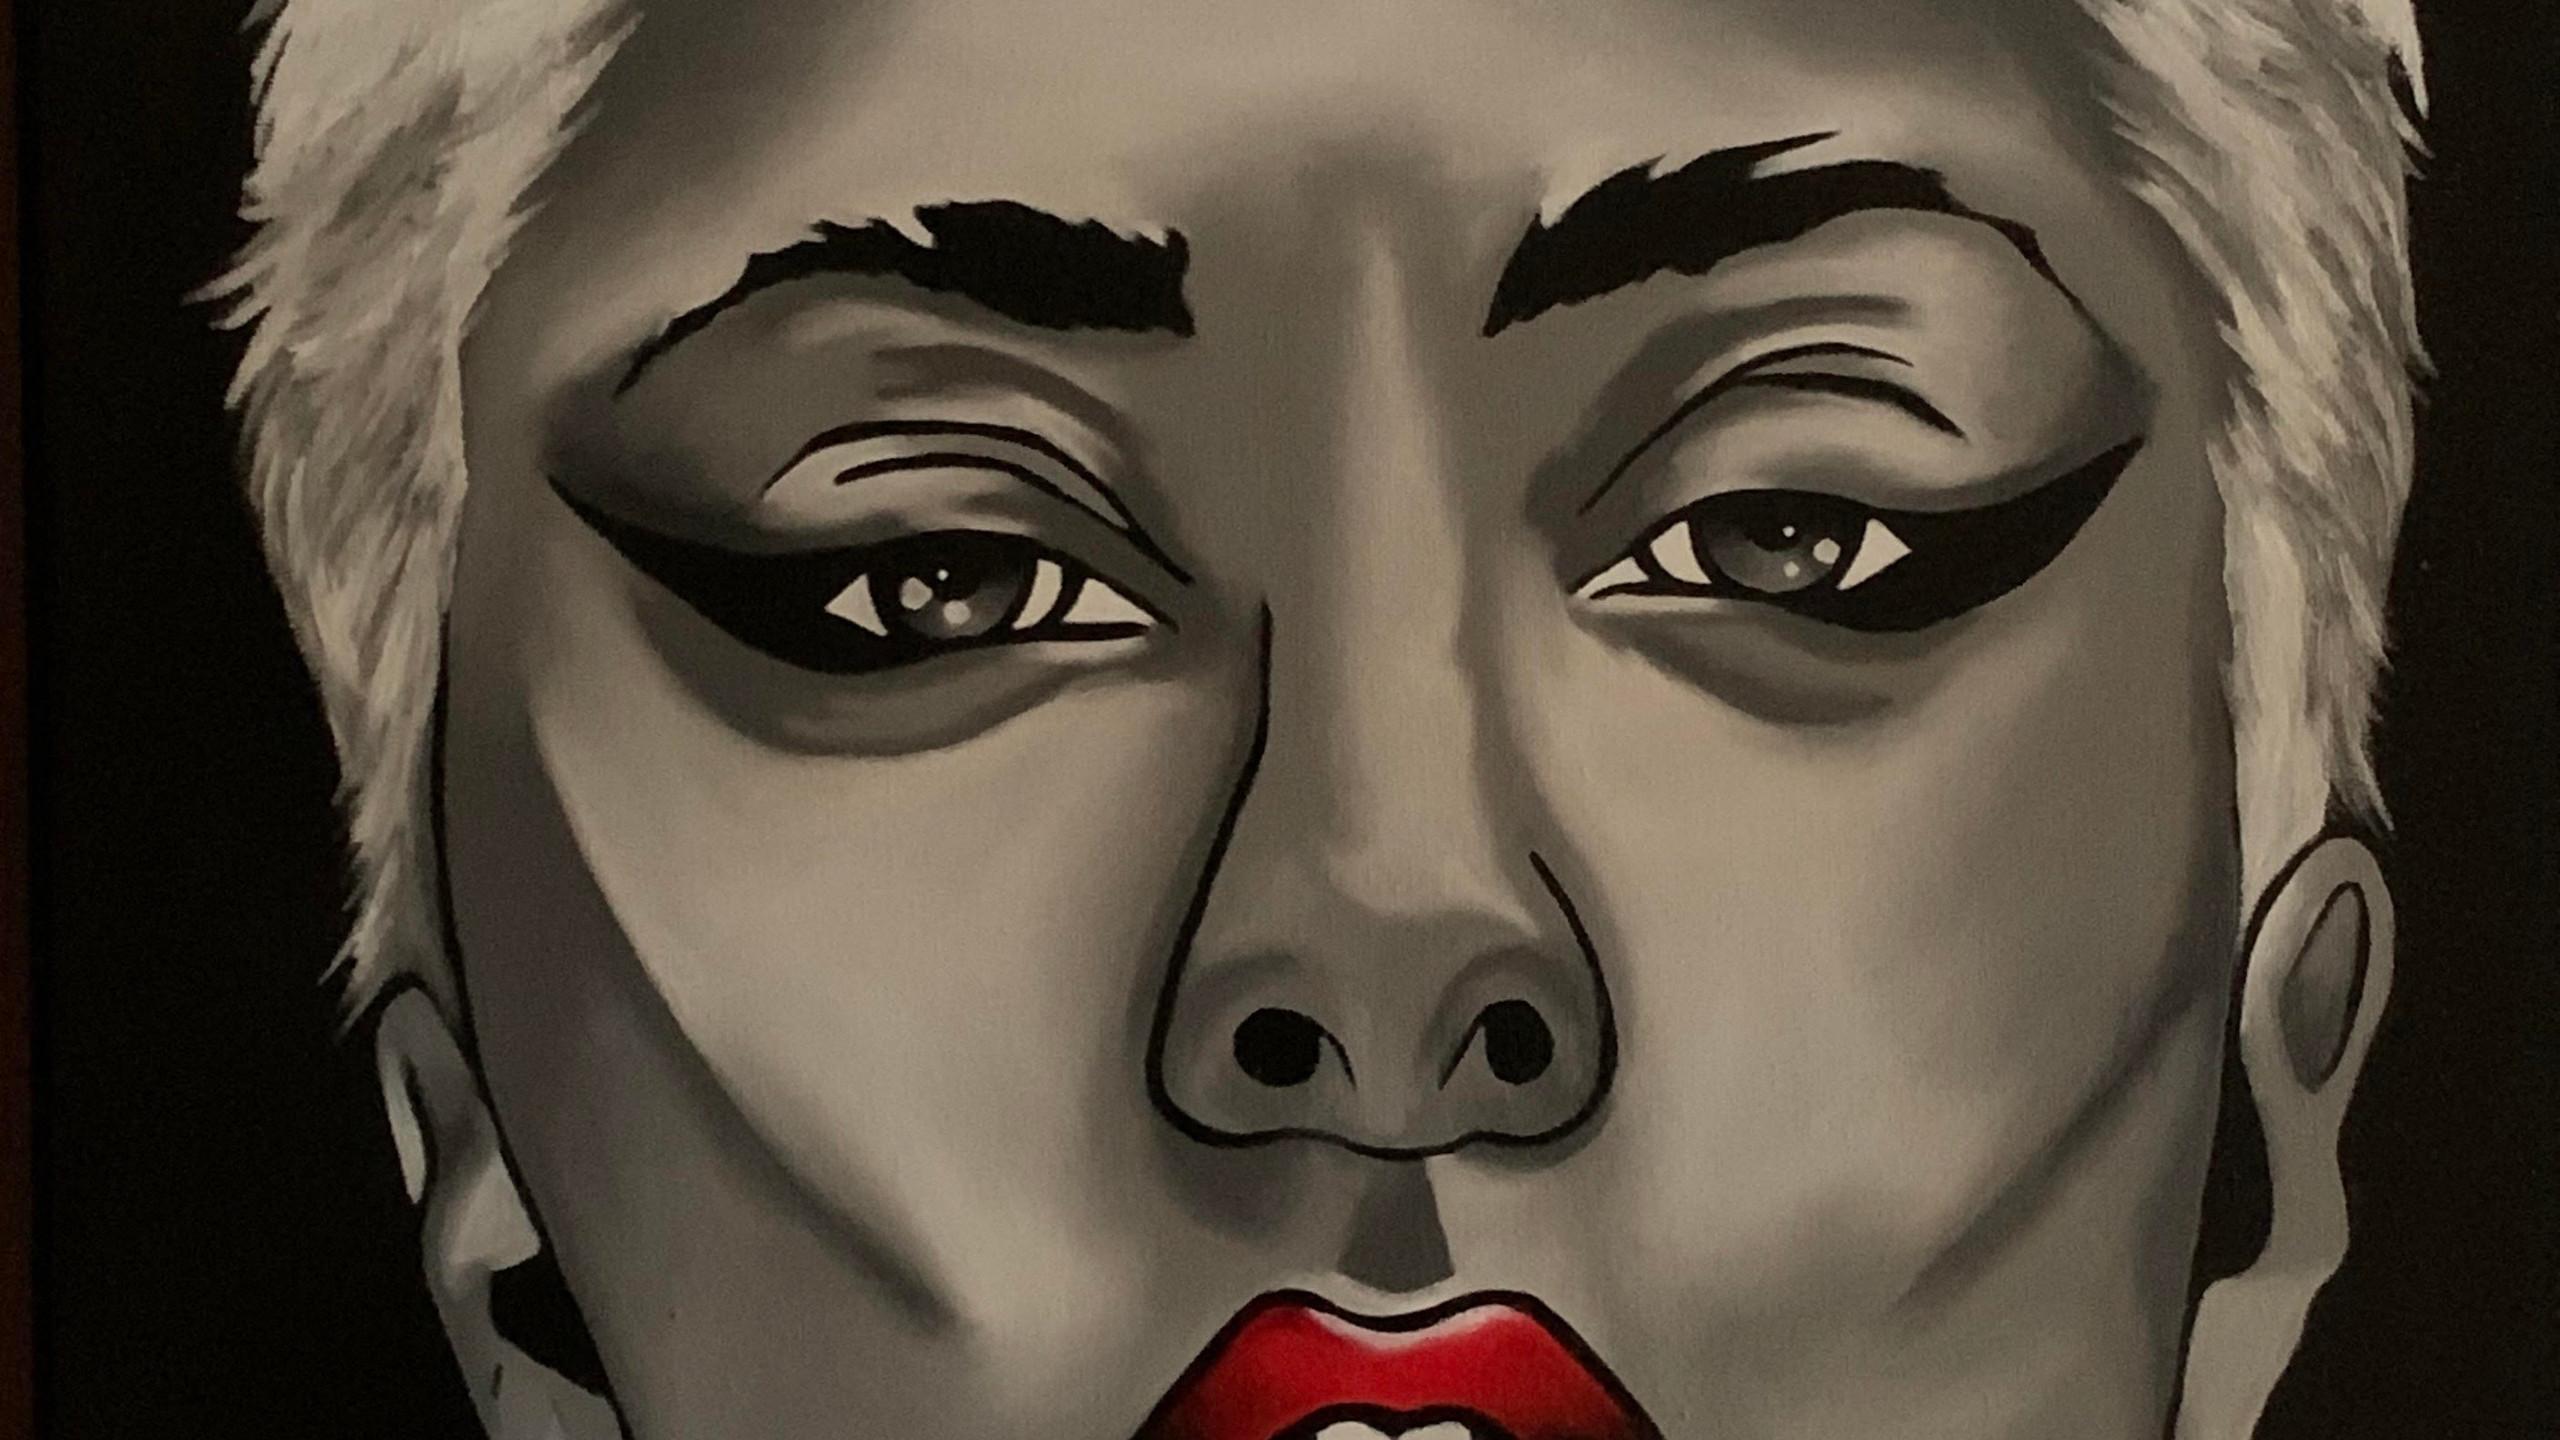 Gaga, 16X20, oil on canvas, courtesy of the artist